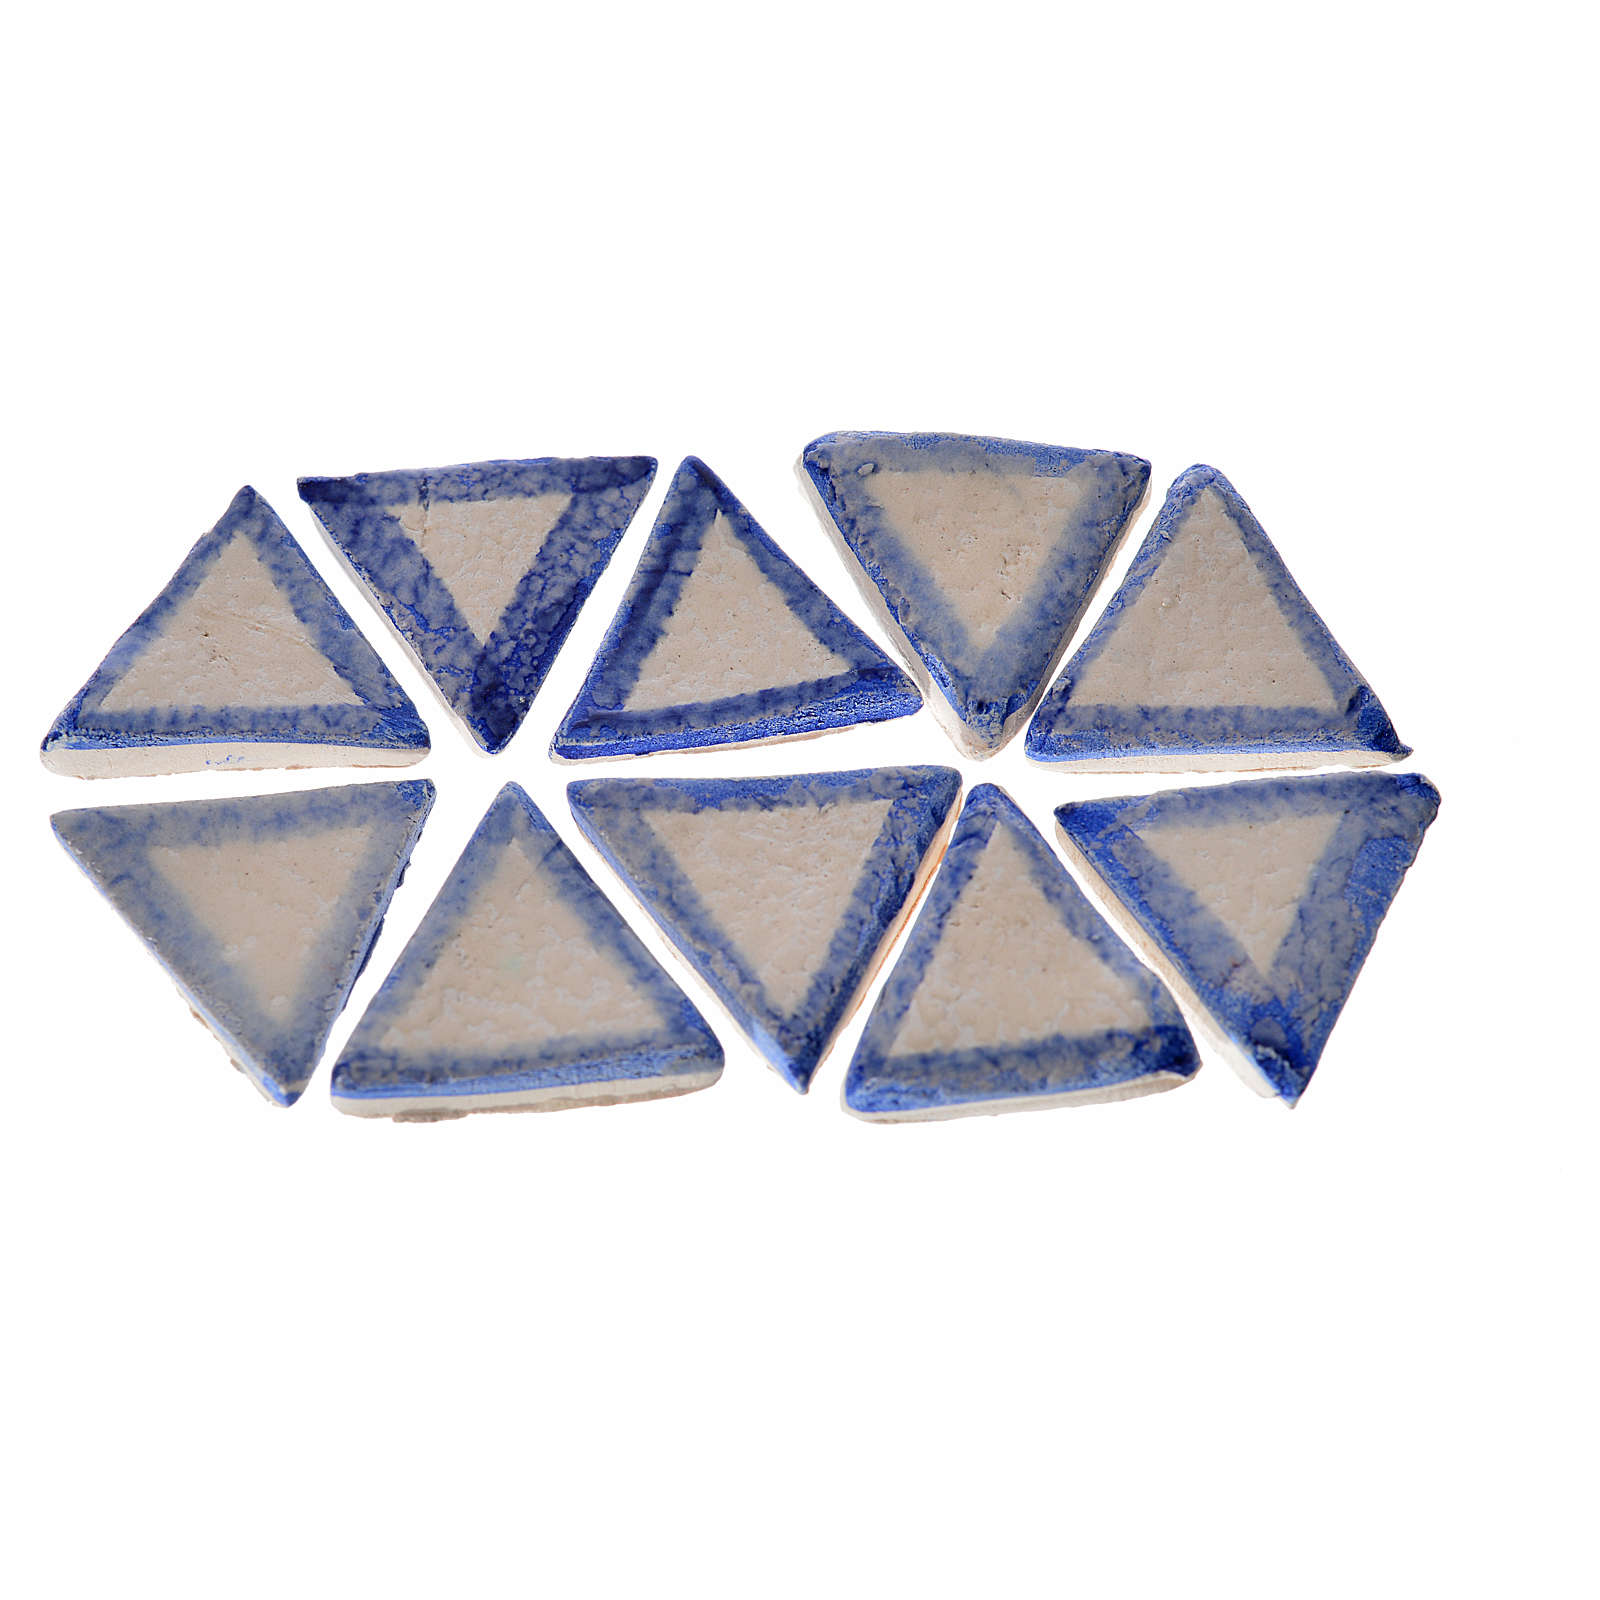 Azulejos de terracota esmaltada, 60pz triangulares linea azul 4